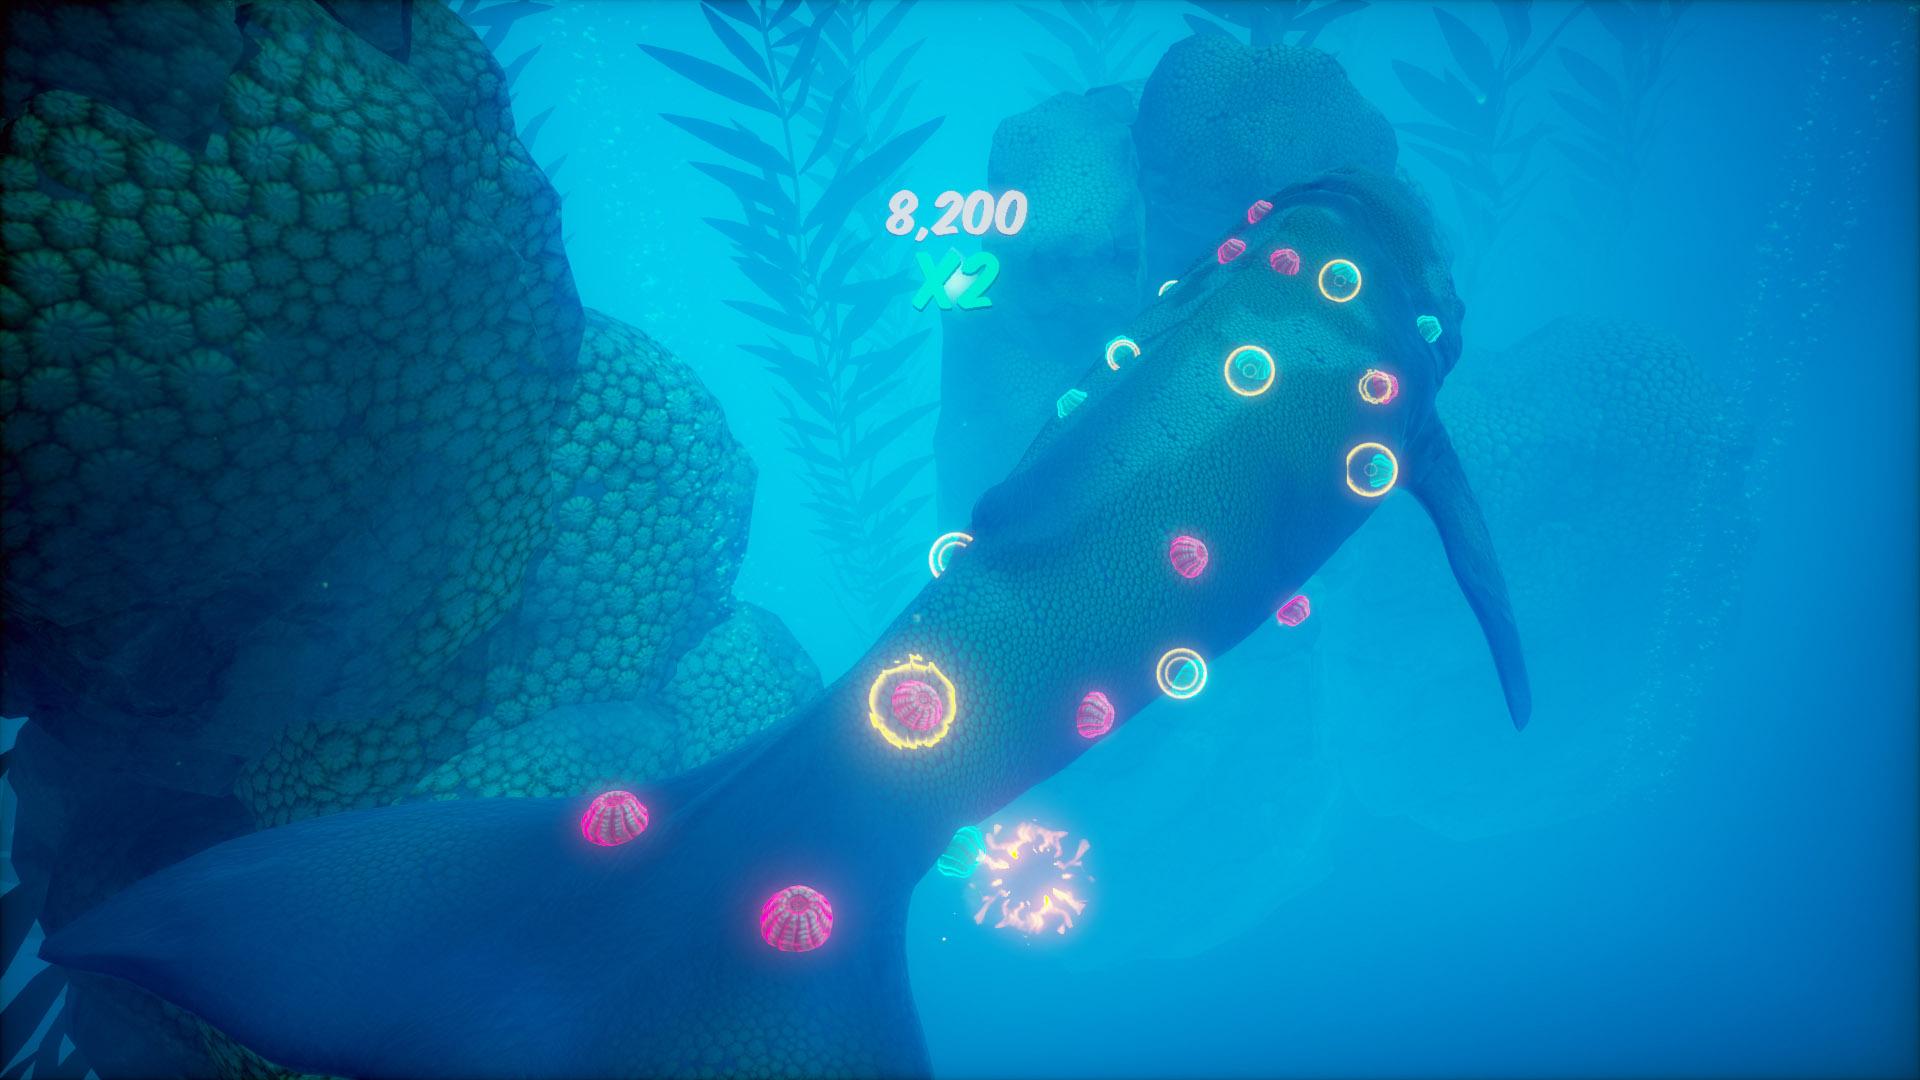 『DEXED』ゲーム画面